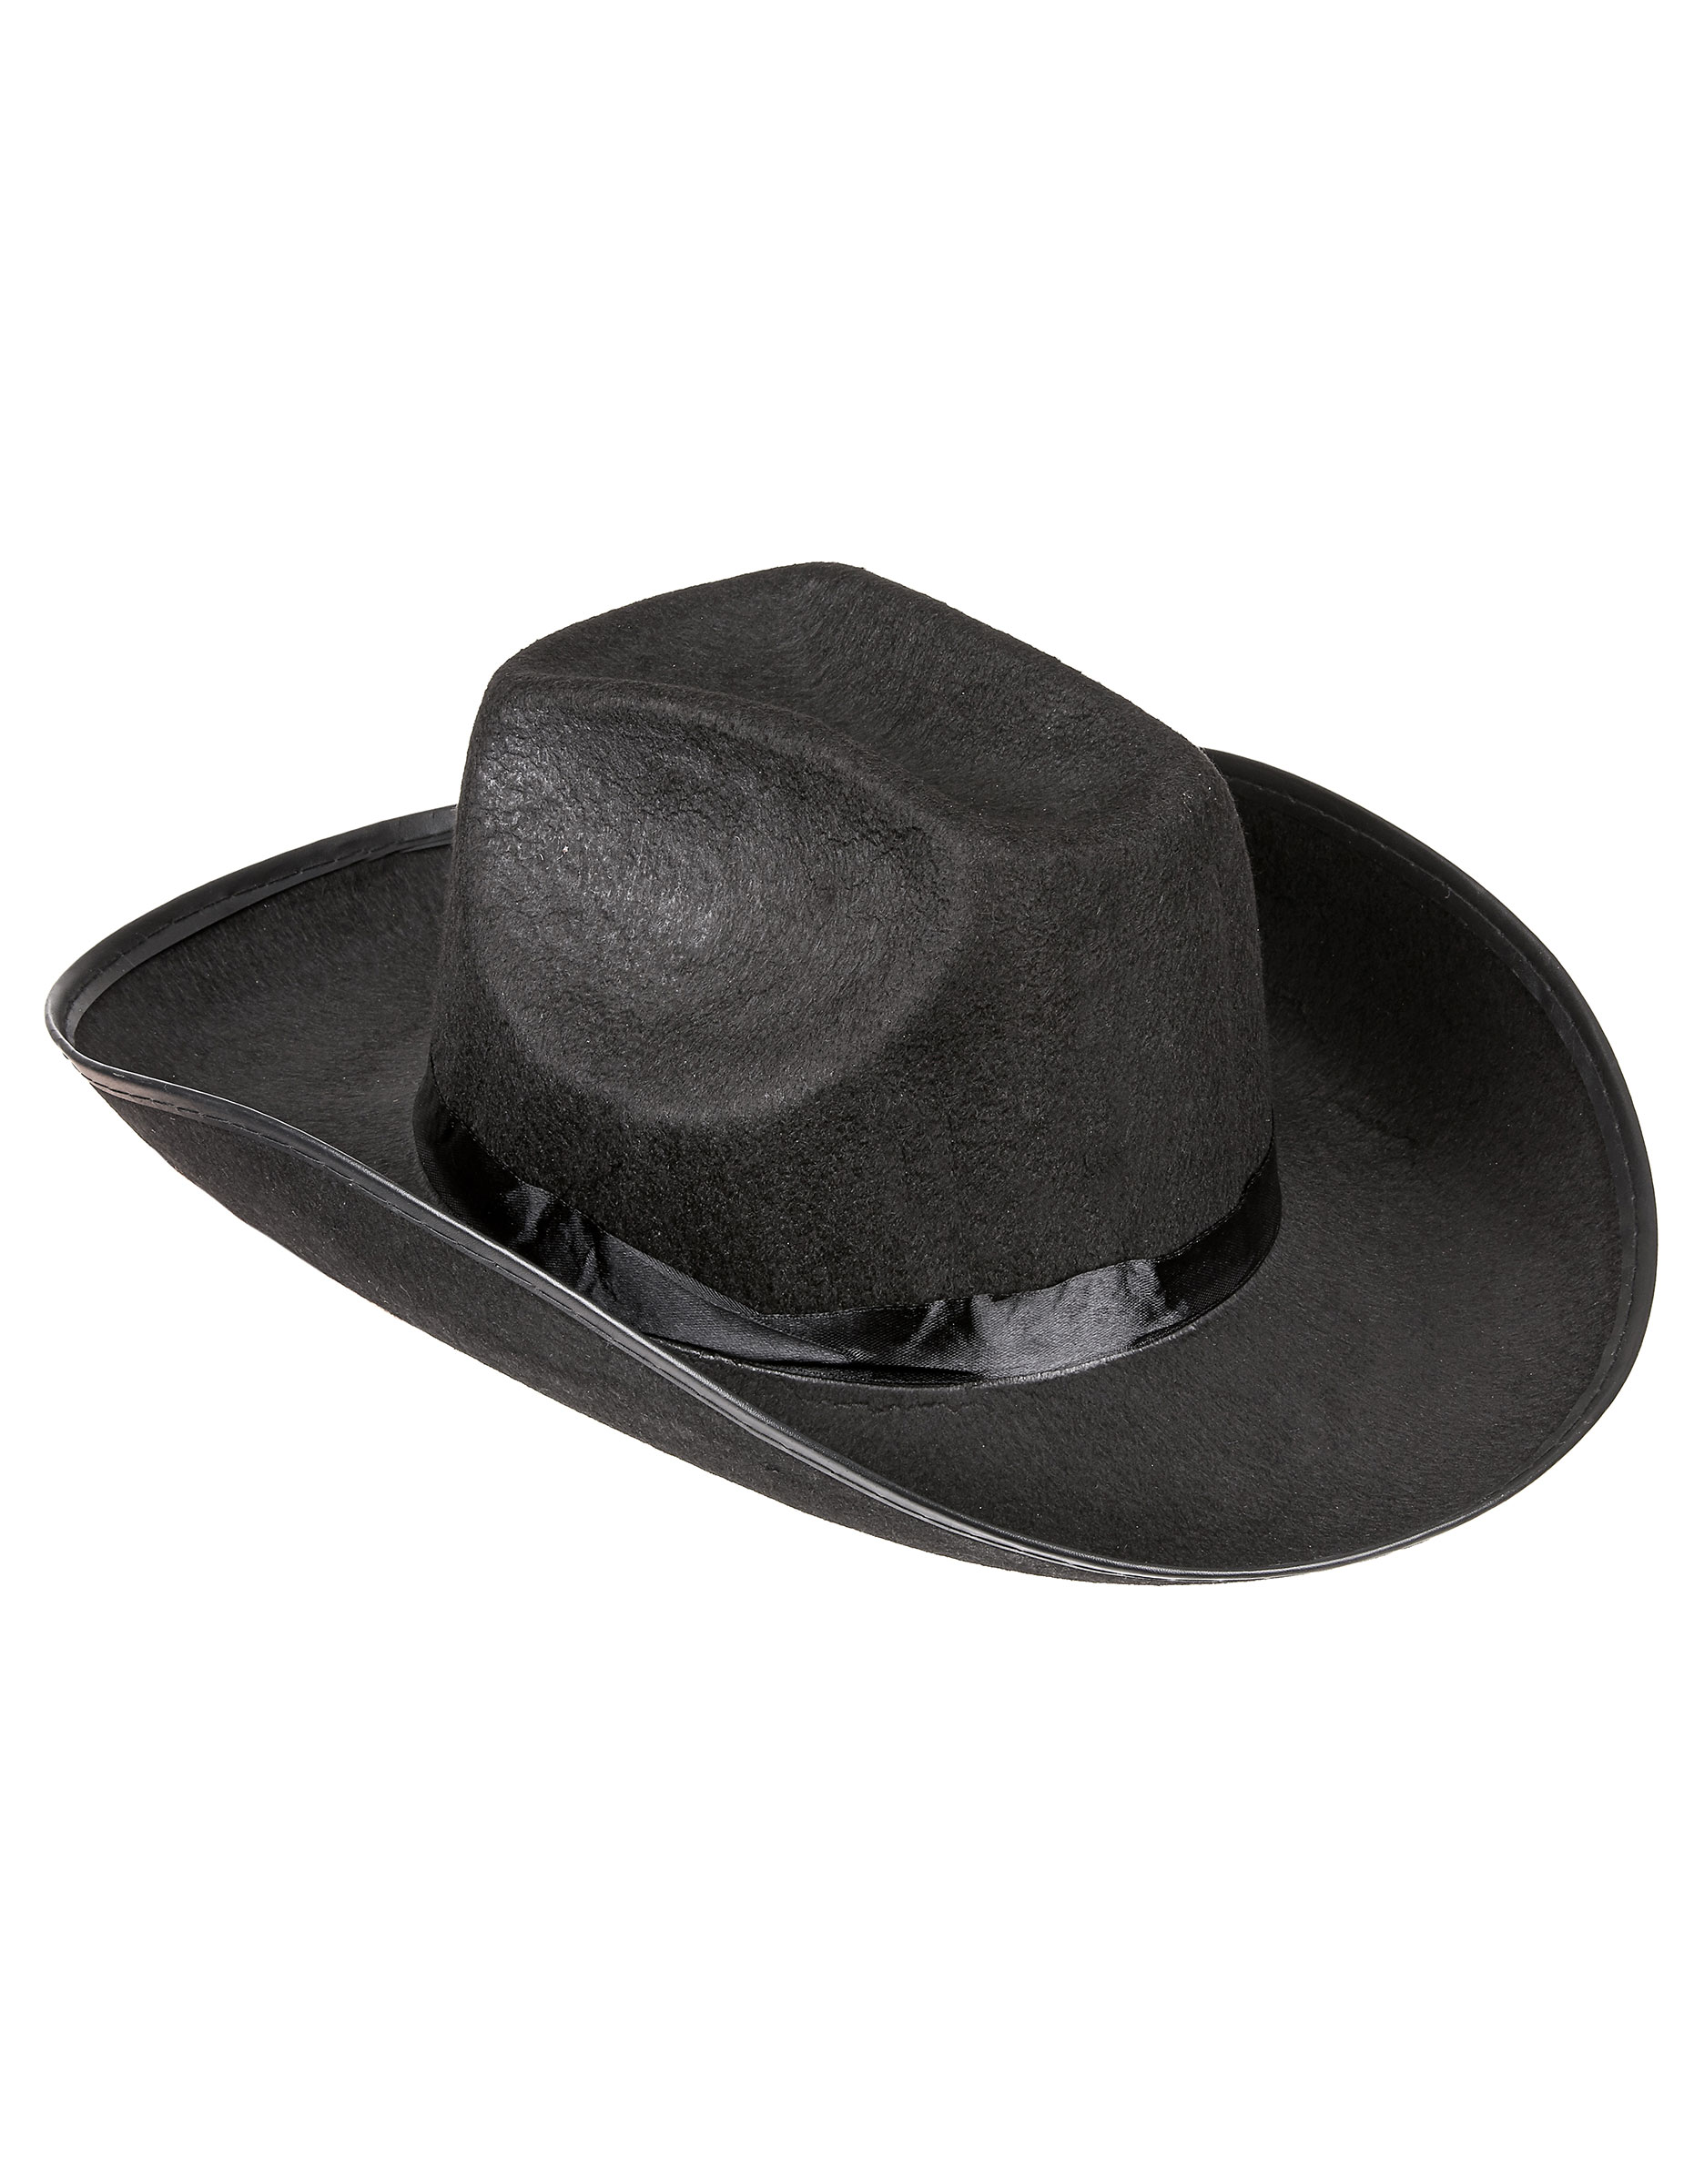 Cappelli Western per cowboy in erba - Vegaoo.it 8adc40ba4415